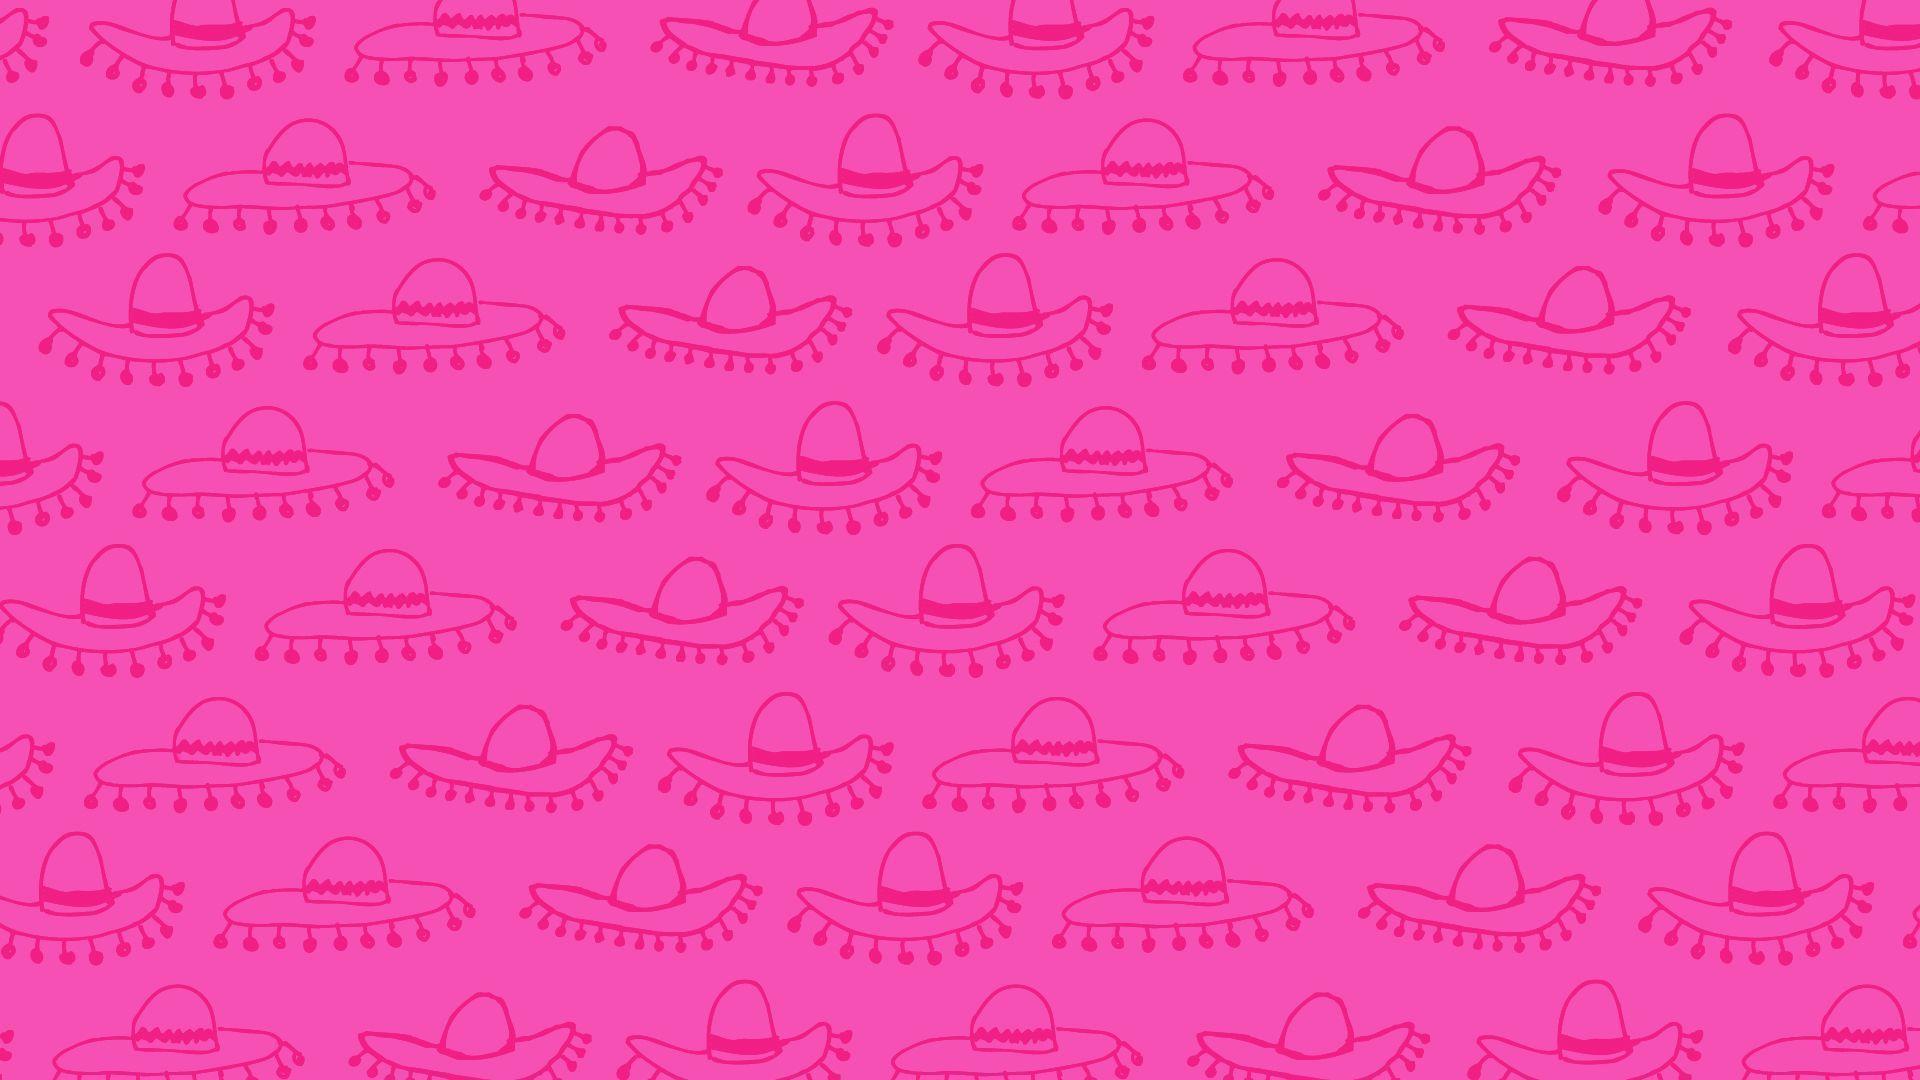 Happy Cinco de Mayo Free Wallpaper Downloads